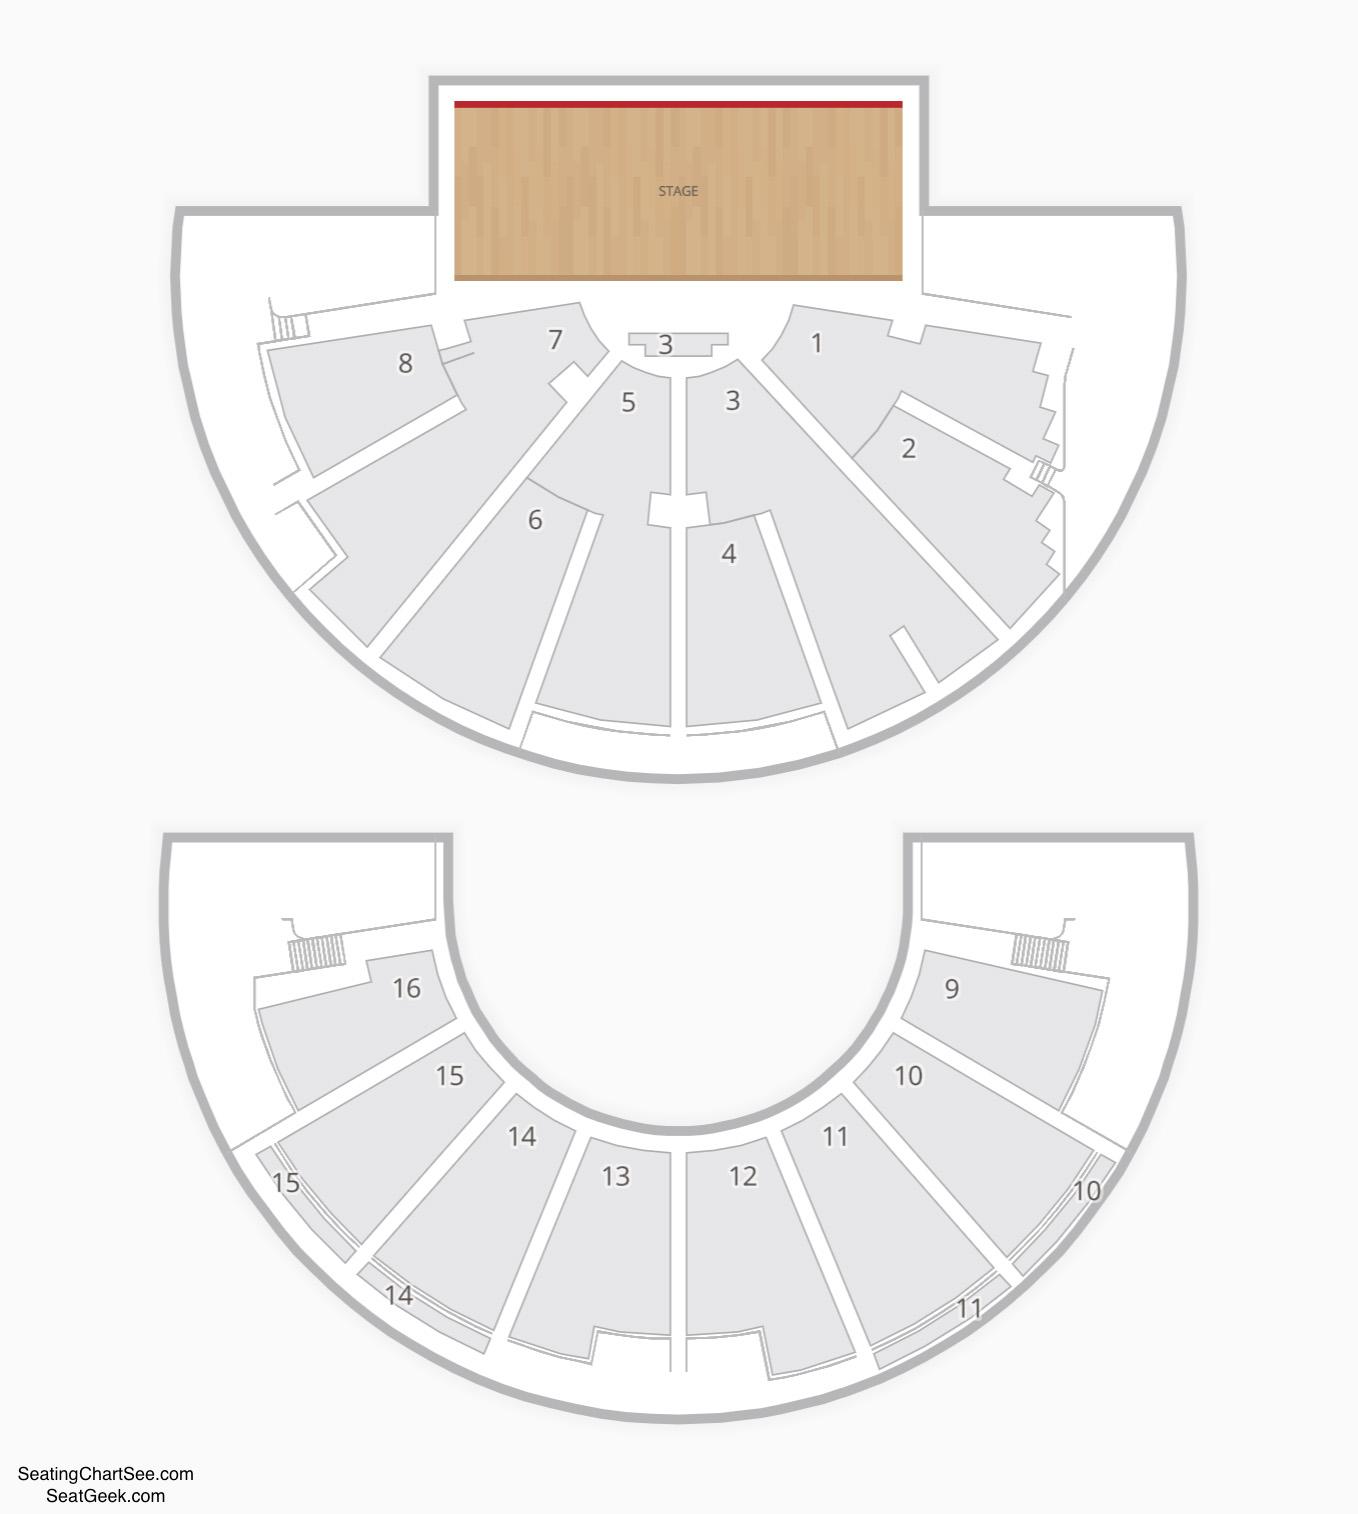 Ryman Auditorium Seating Chart Concert